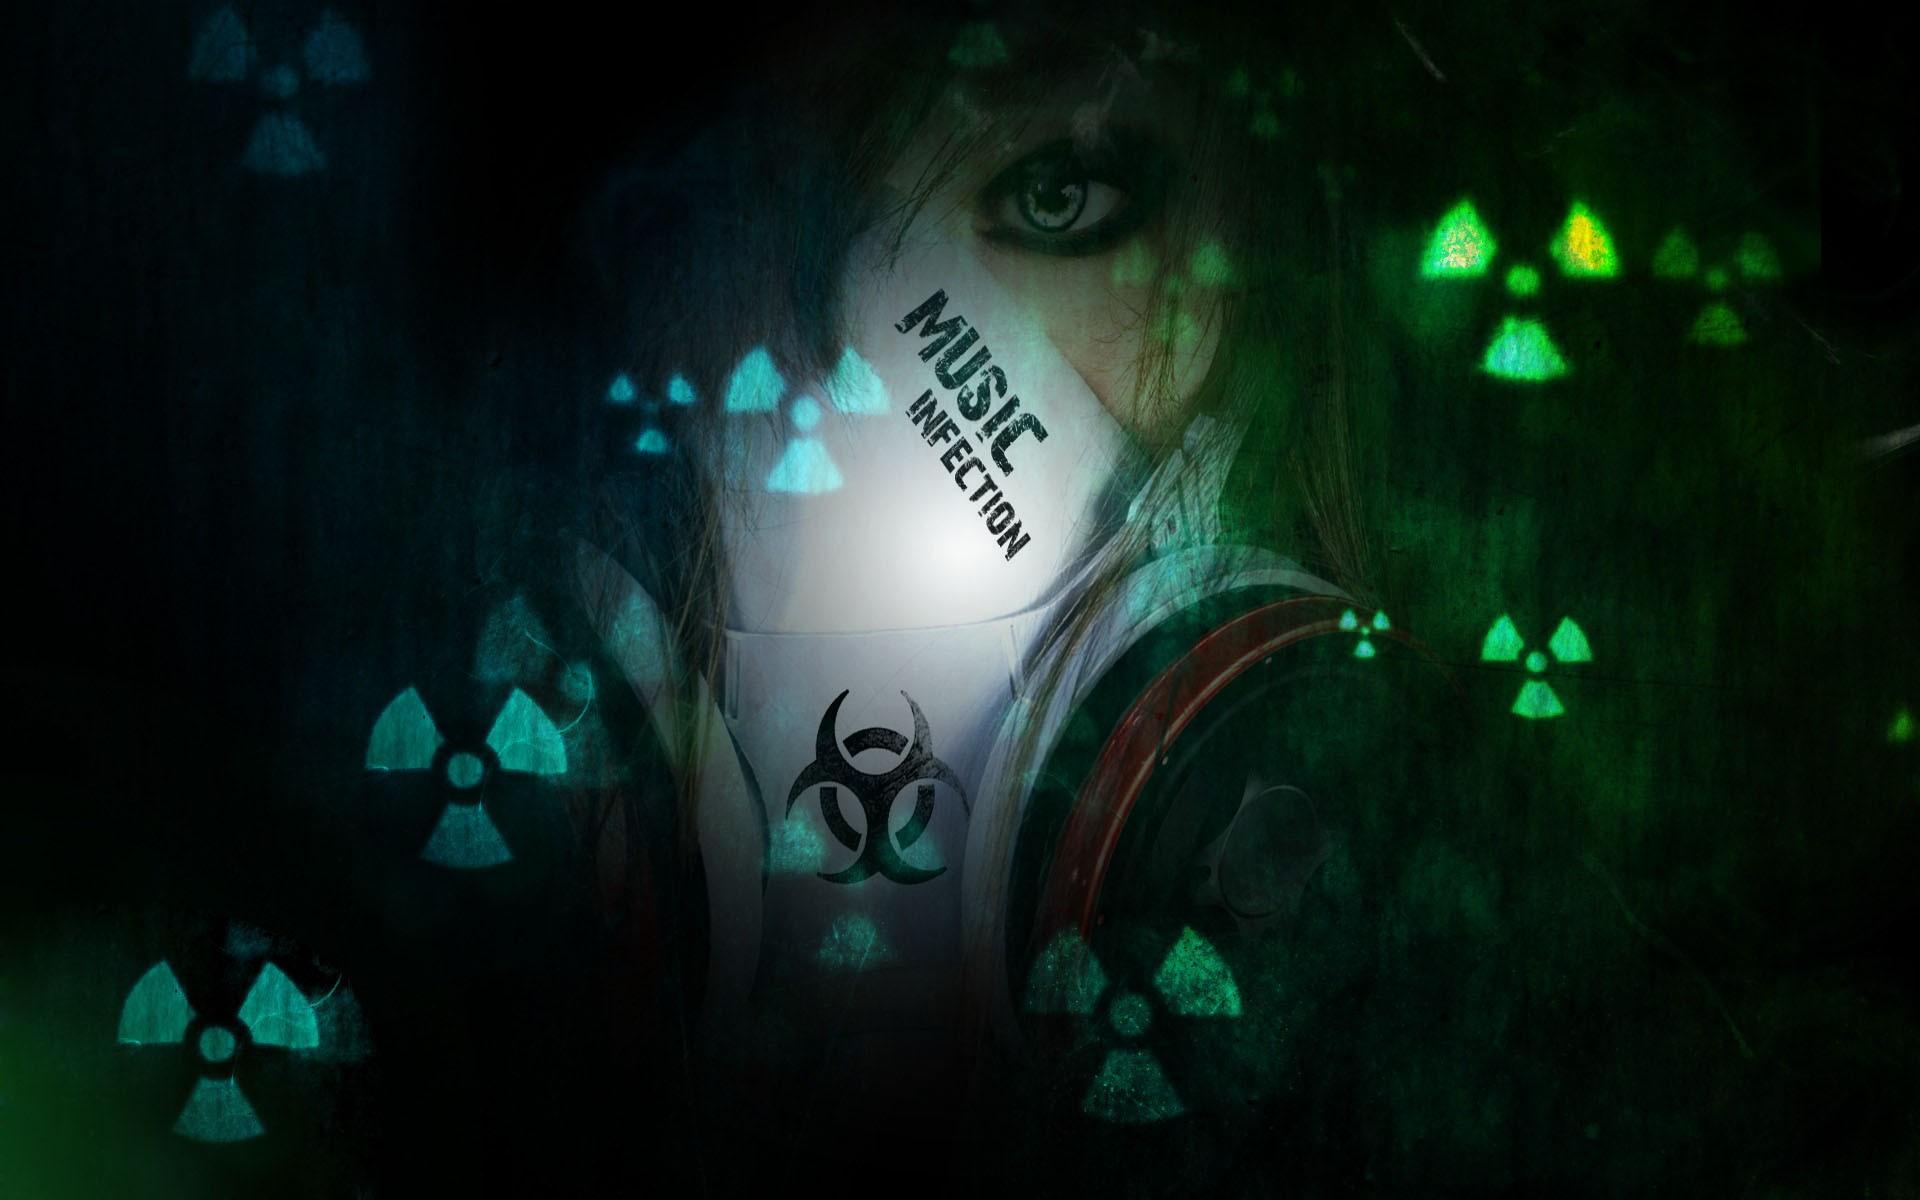 Toxic Symbol Wallpaper Toxic music wallpaper 1920x1200